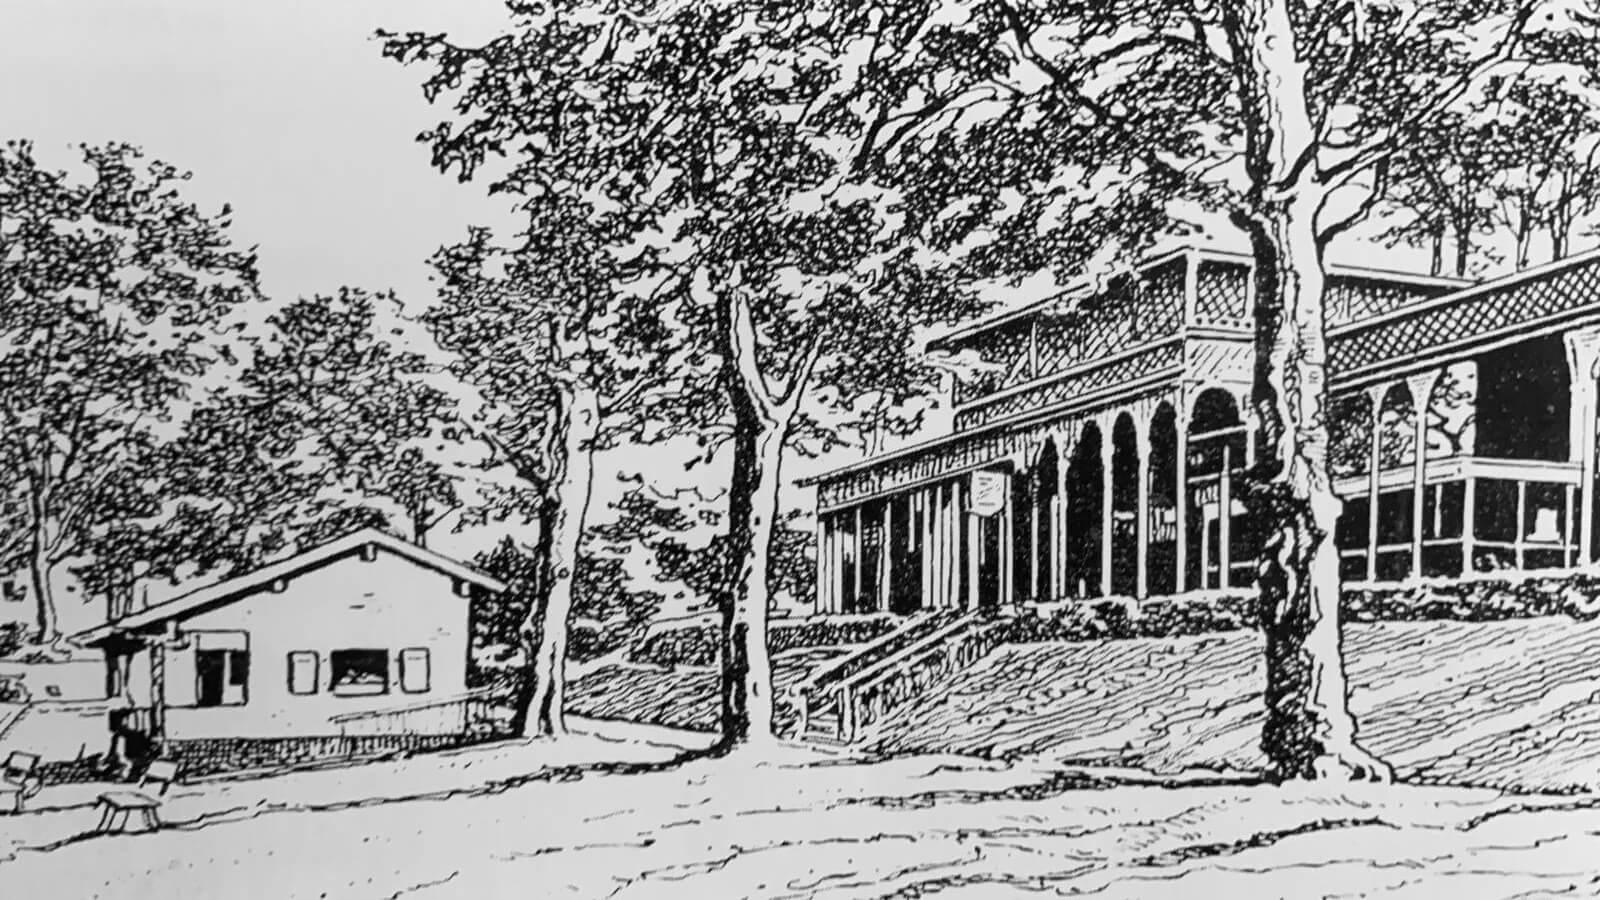 https://tcbw-wiesbaden.de/wp-content/uploads/2021/03/Zeichnung-1962.jpg